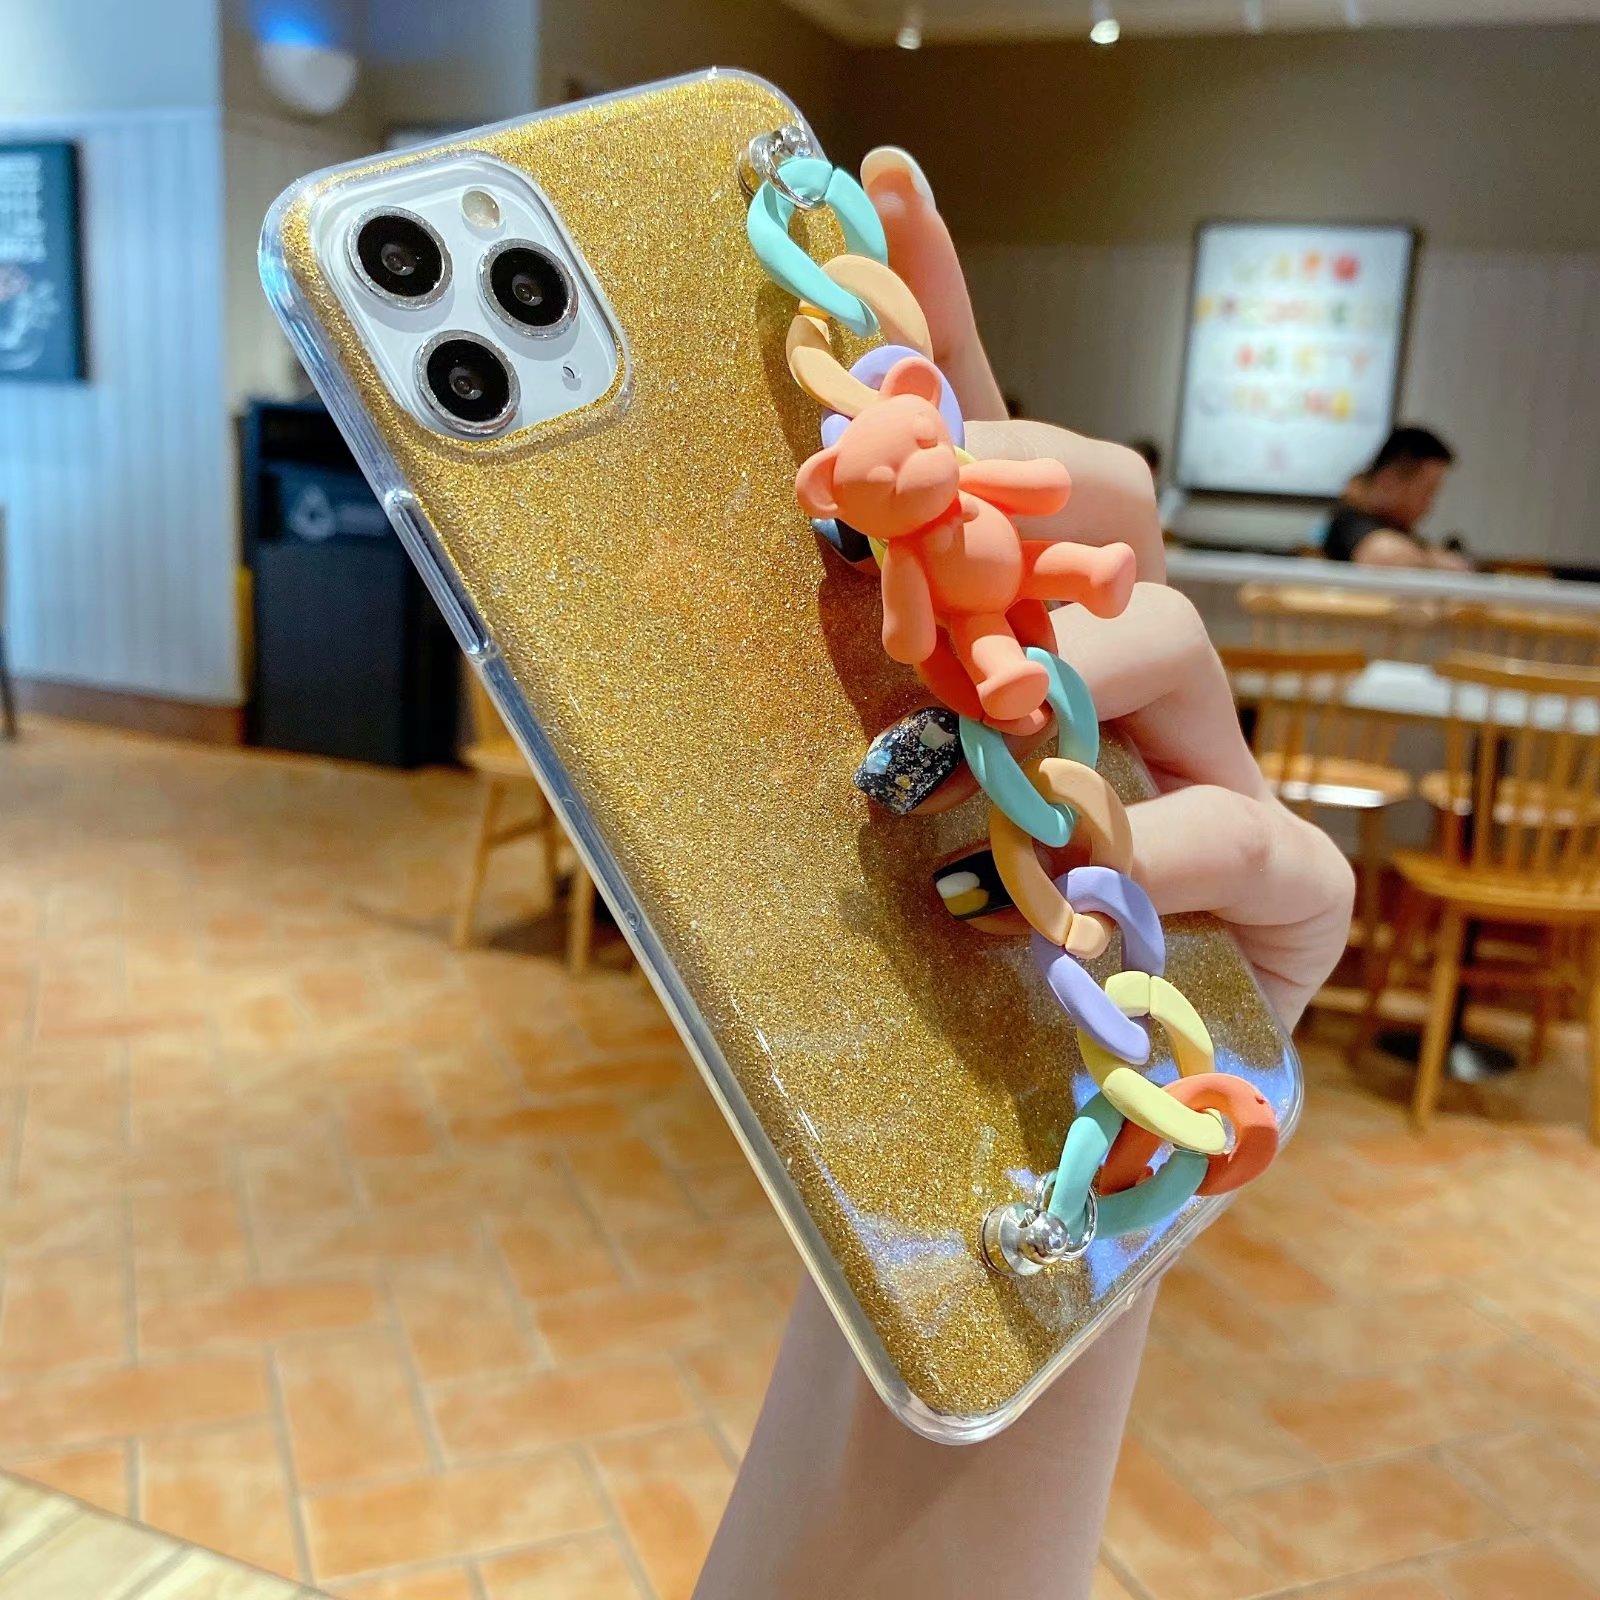 Samsung A7 A9 A5 A8 Plus A6 J3 J4 J6 J7 J8 J2 Pro 2018 A9S Glitter Case Cartoon Bear Bracelet เคสโทรศัพท์แบบนิ่ม